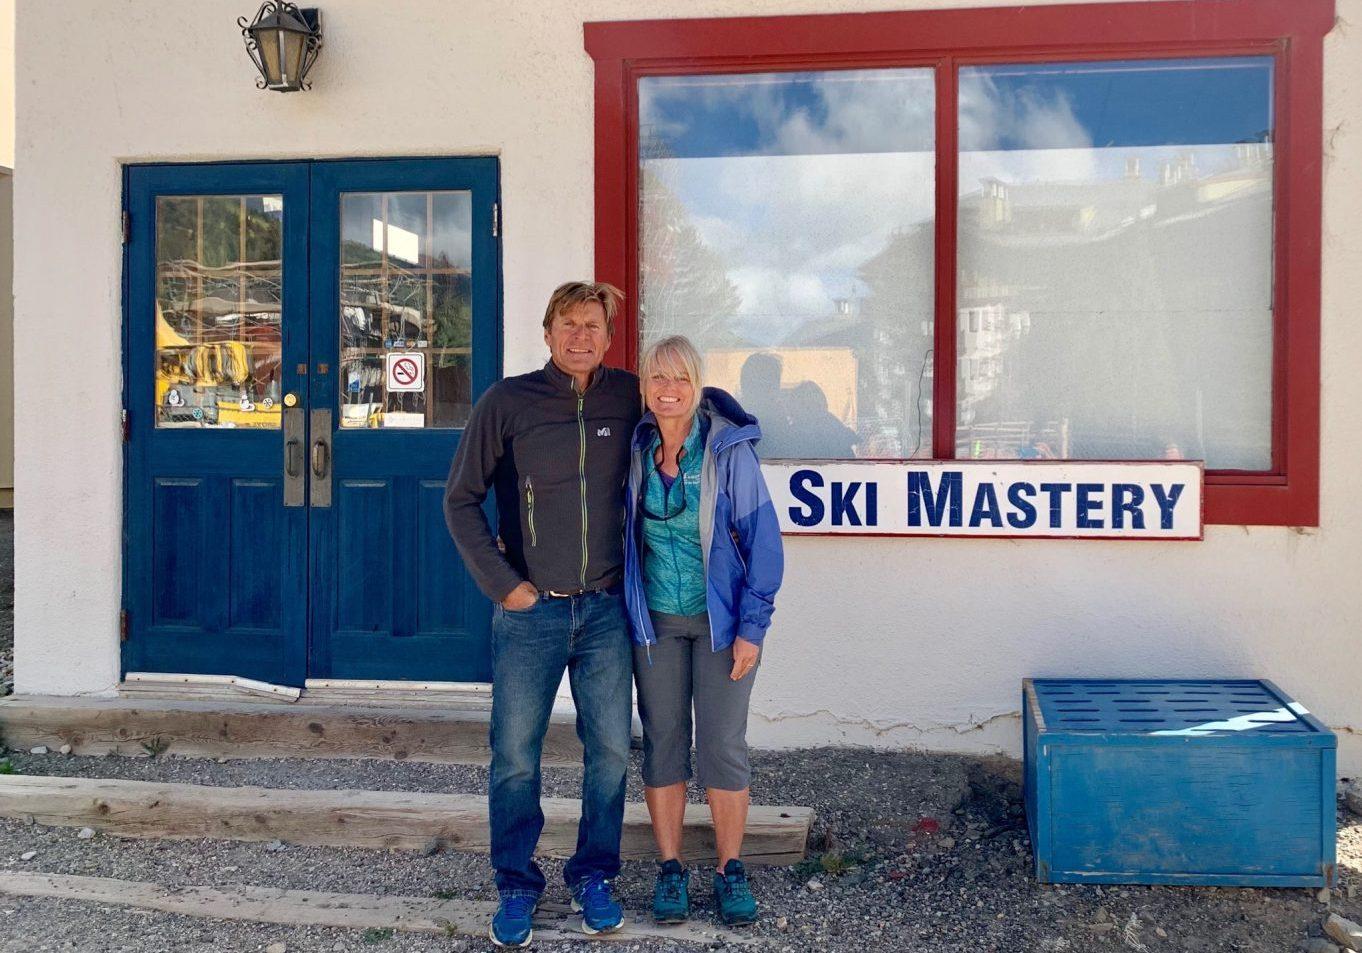 Le Ski Mastery shop owners